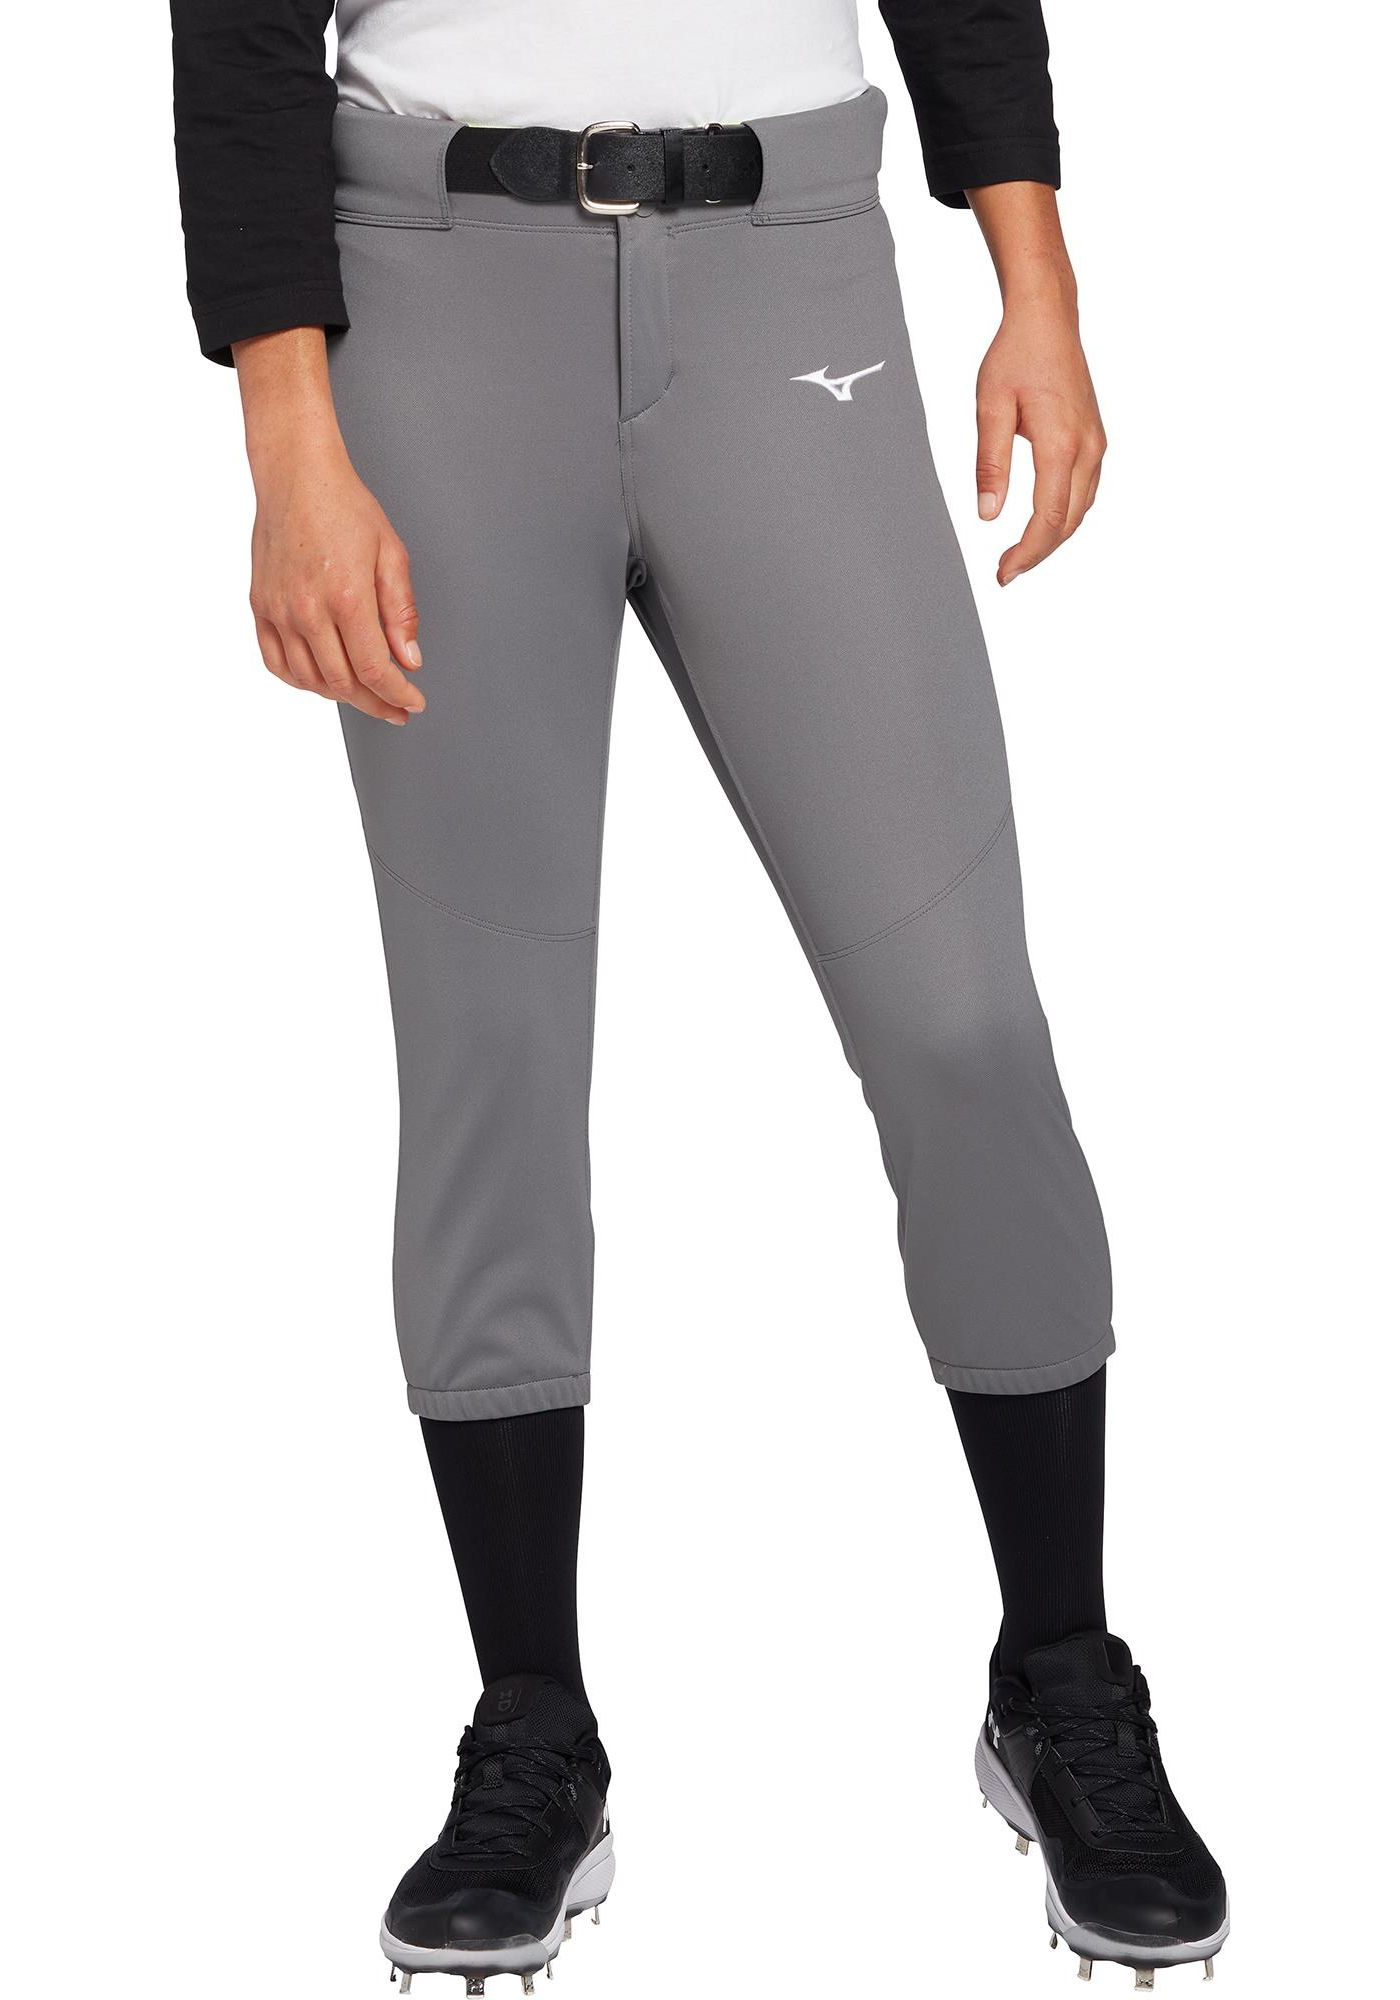 Mizuno Women's Belted Stretch Softball Pants